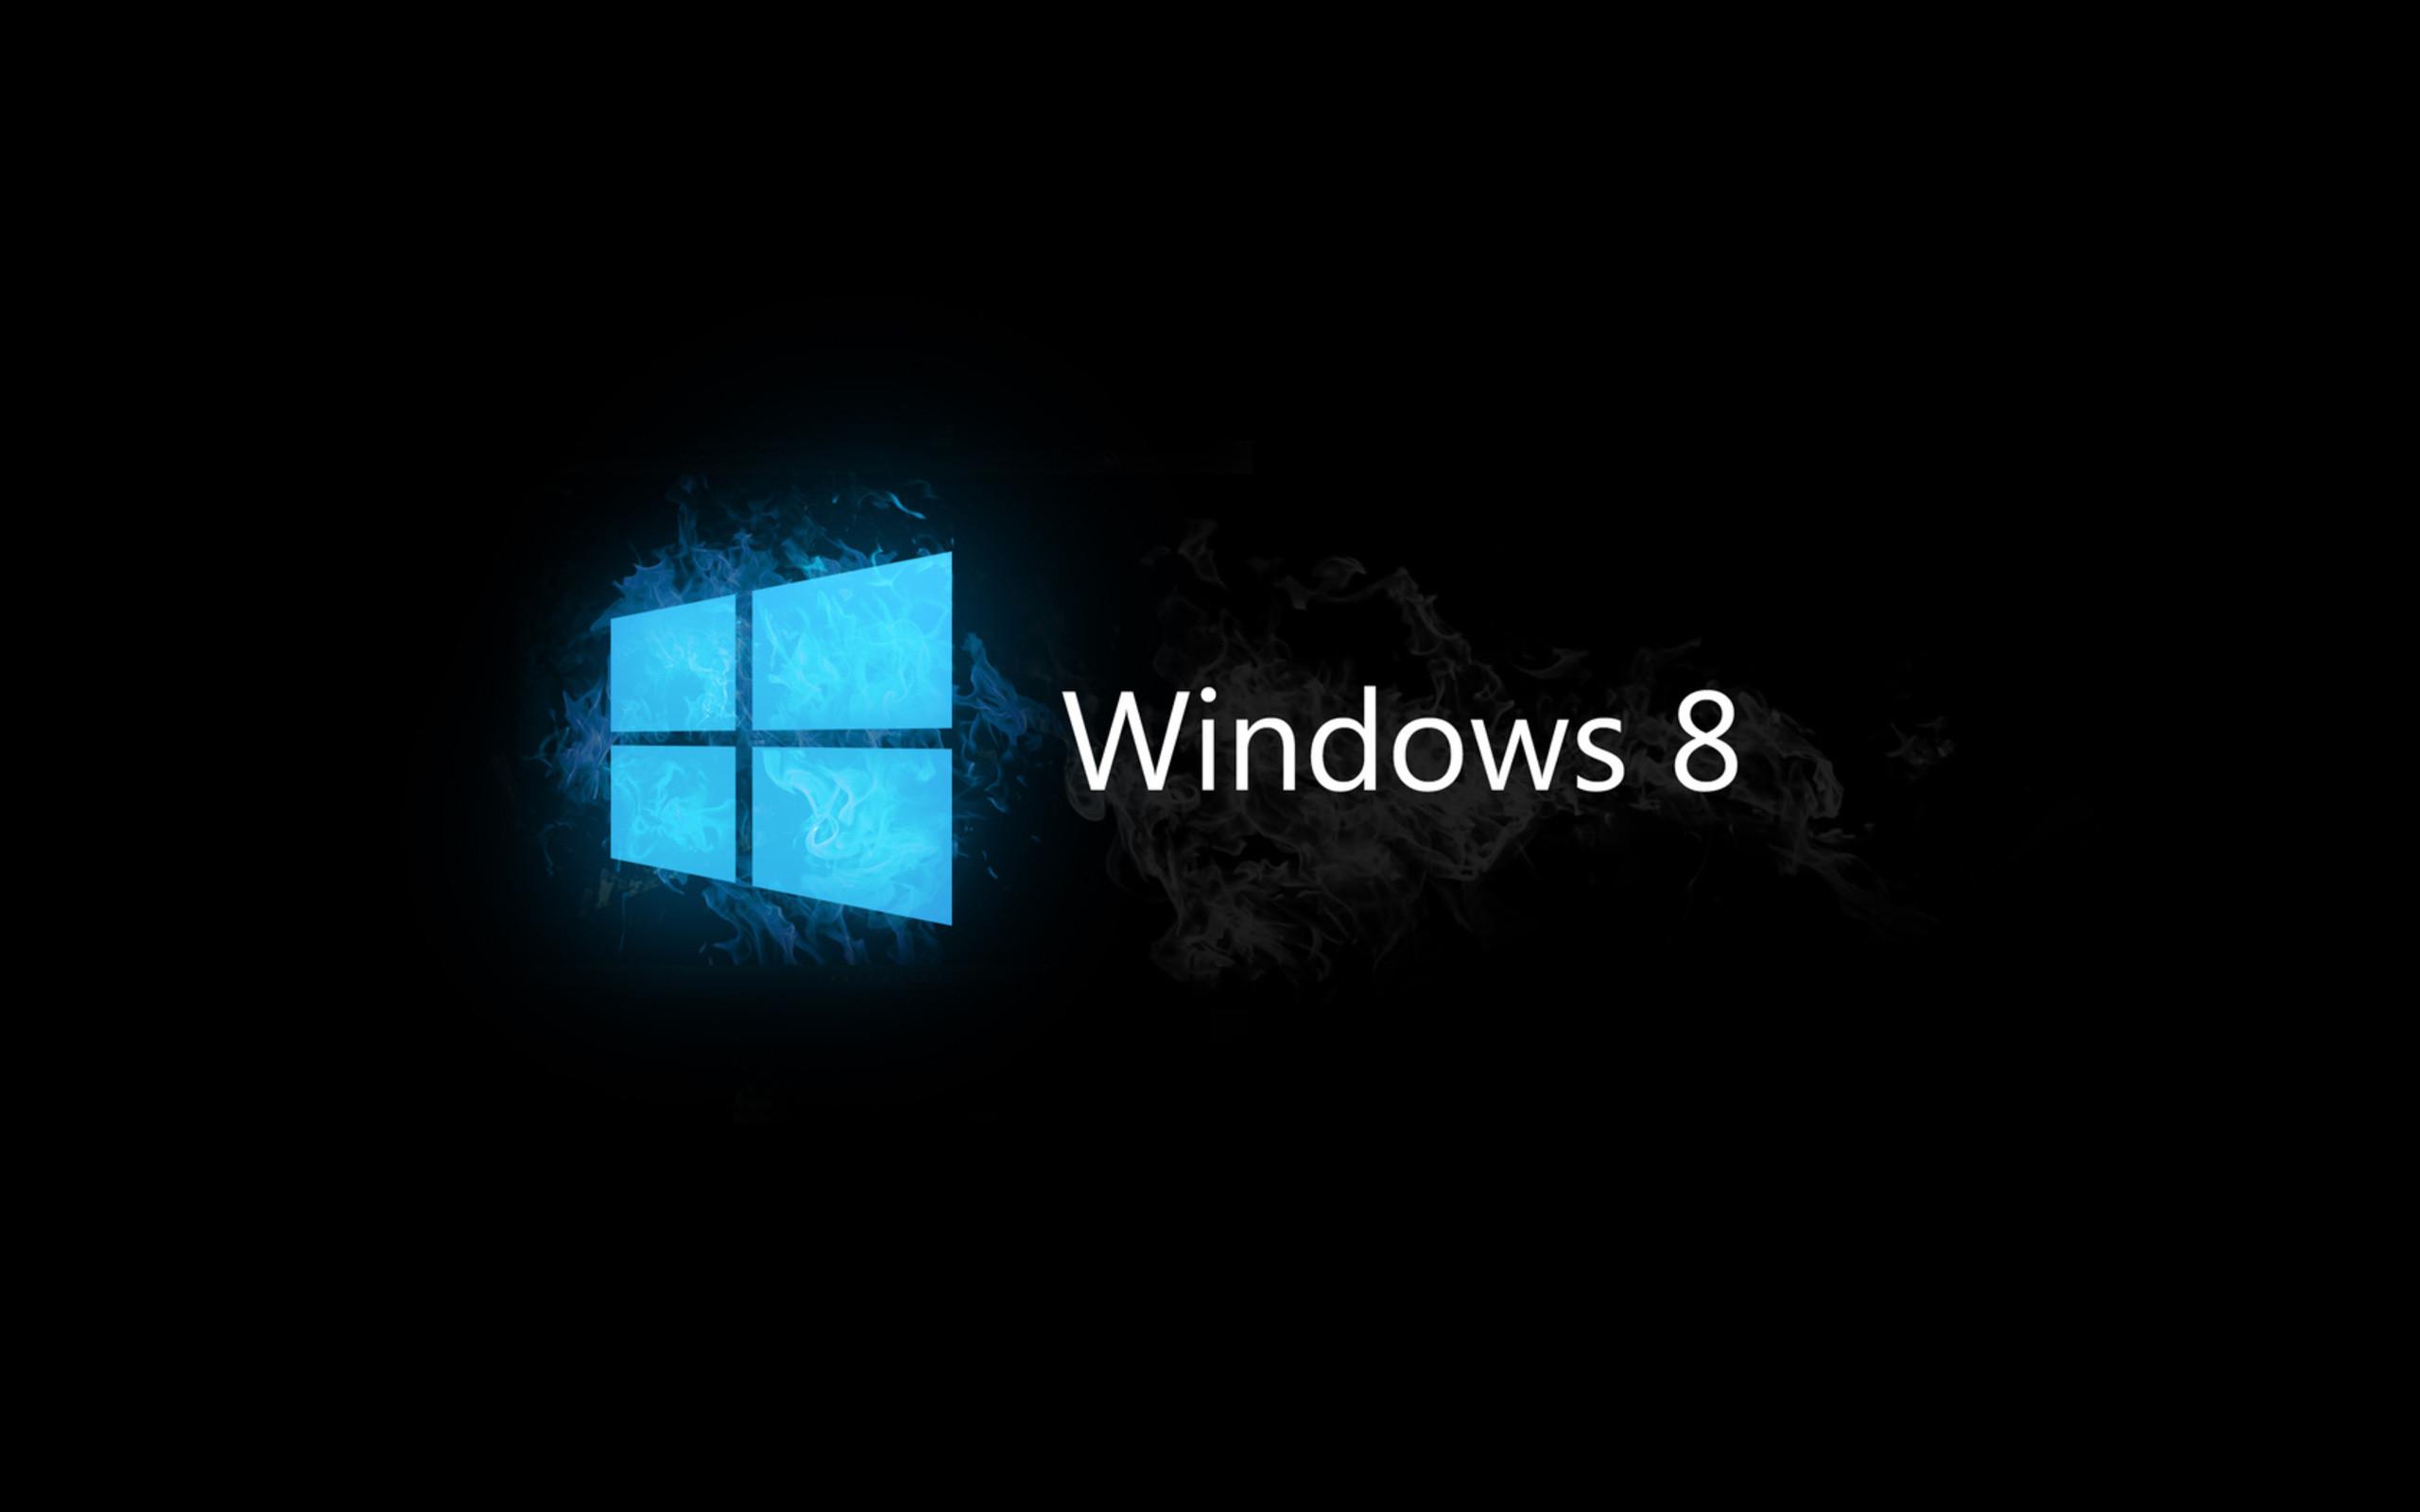 Windows 8 Wallpaper Smoke